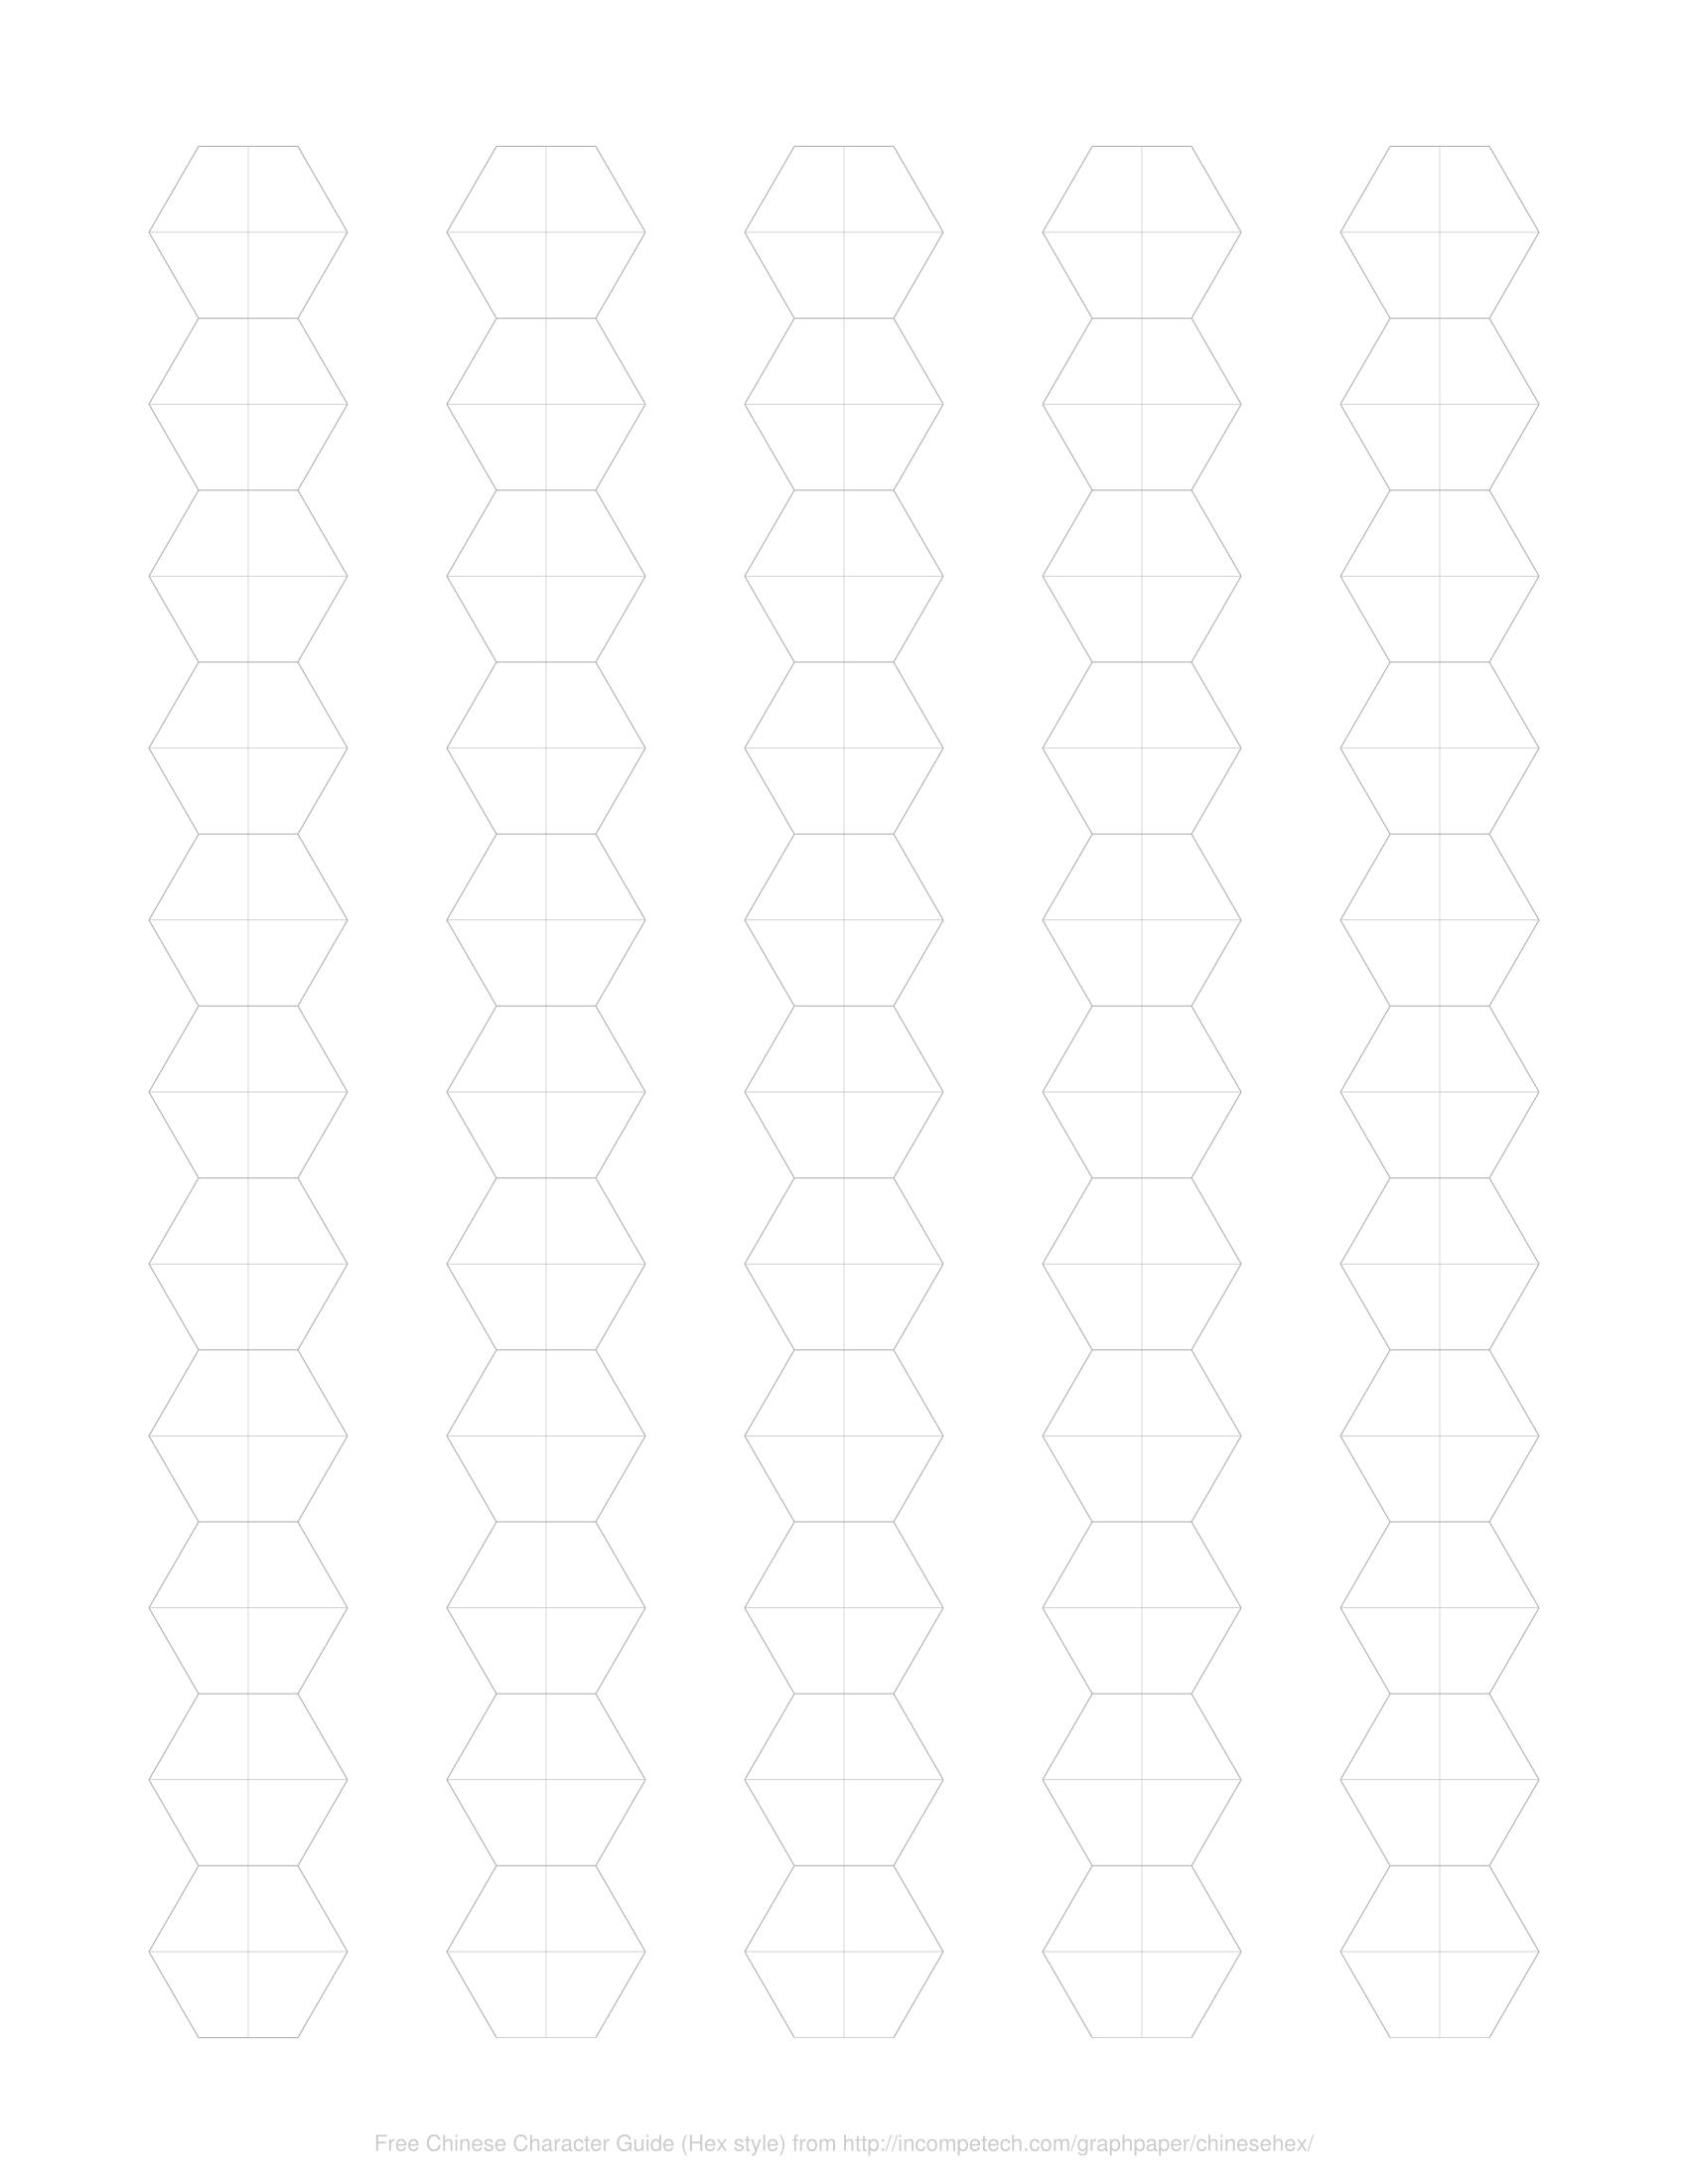 hex paper generator - Monza berglauf-verband com